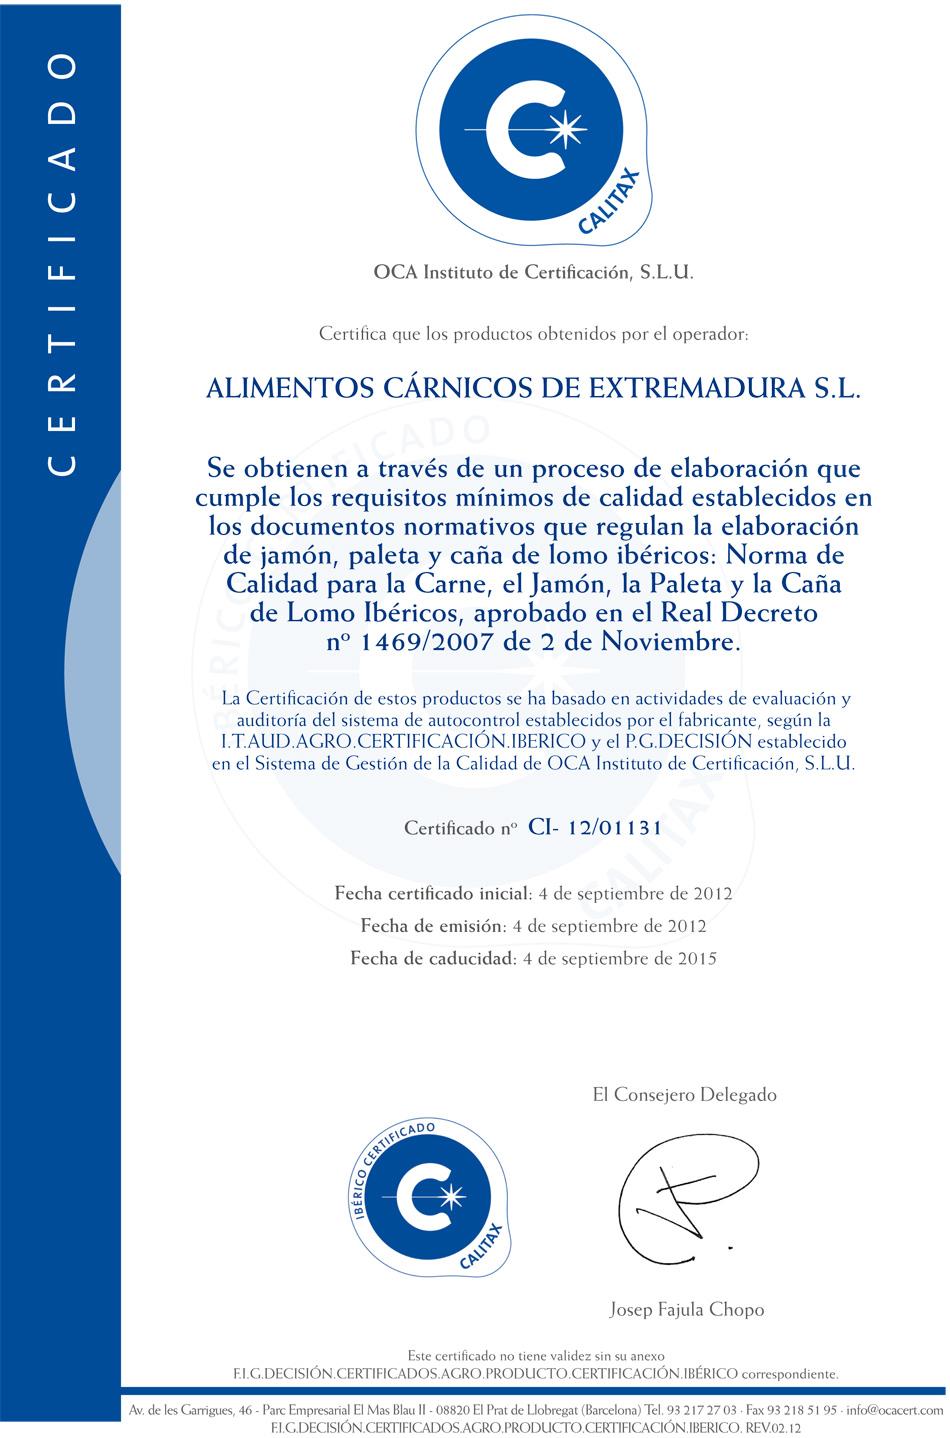 certificado-calidad-ocacert-alicex.jpg